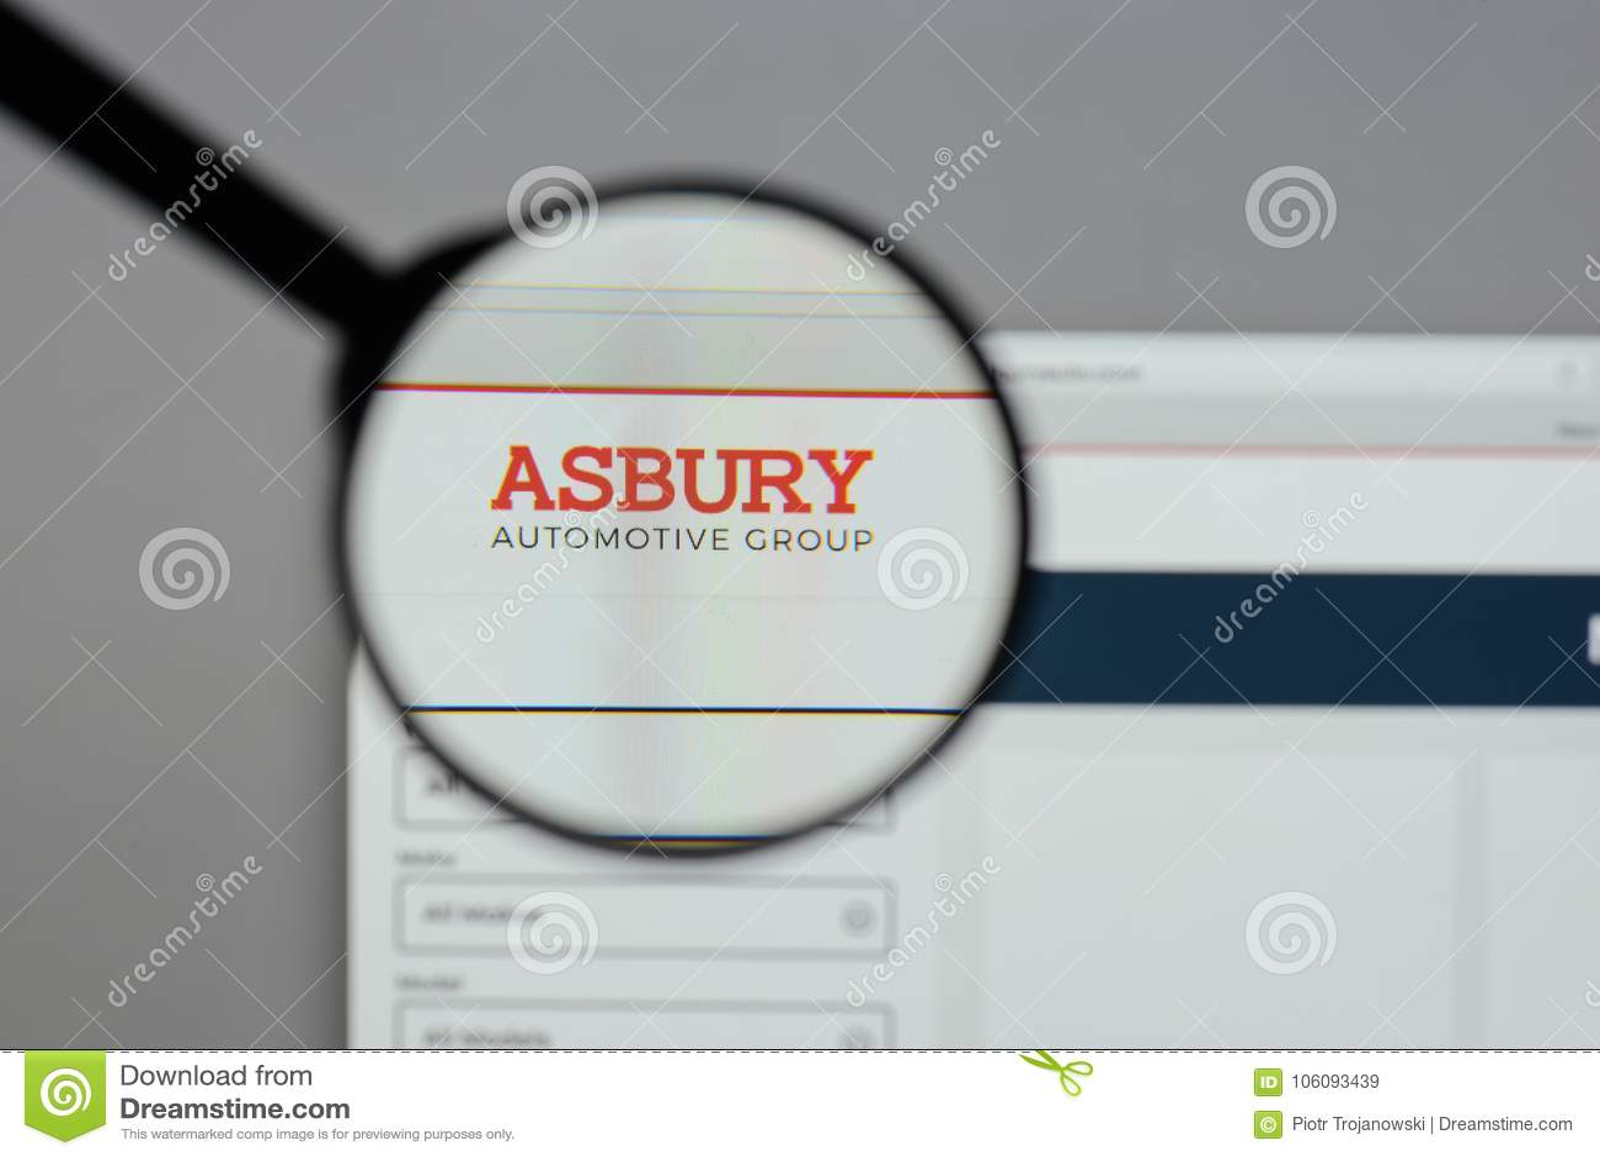 Milan, Italy - August 10, 2017: Asbury Automotive Group logo on